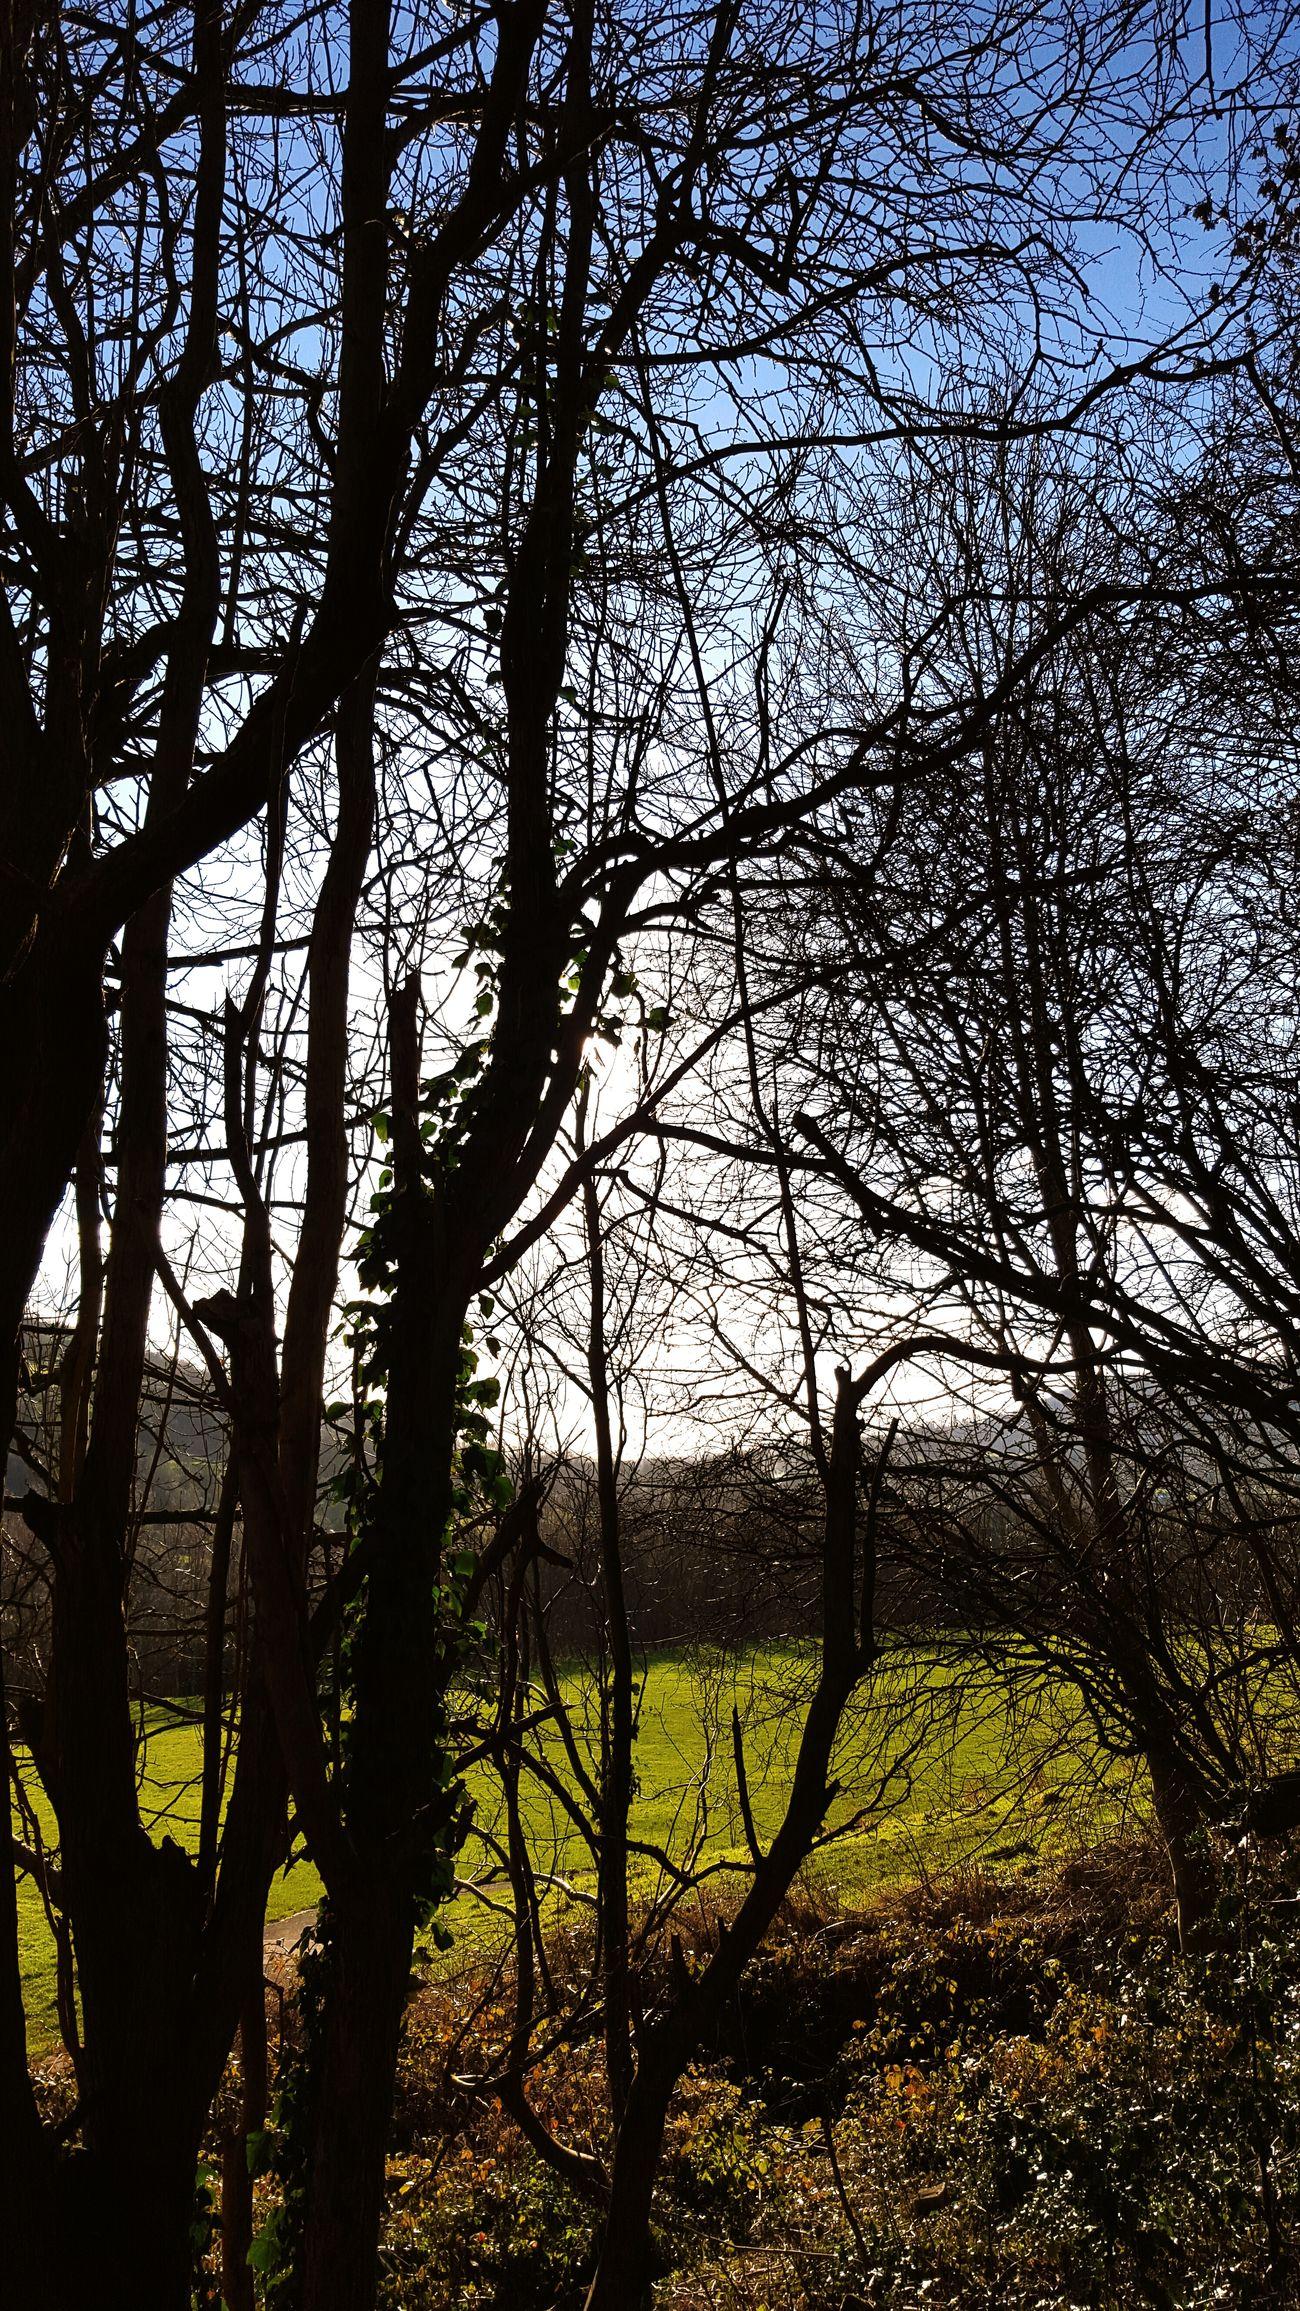 Woods Trees Nature_collection Sneak Peek